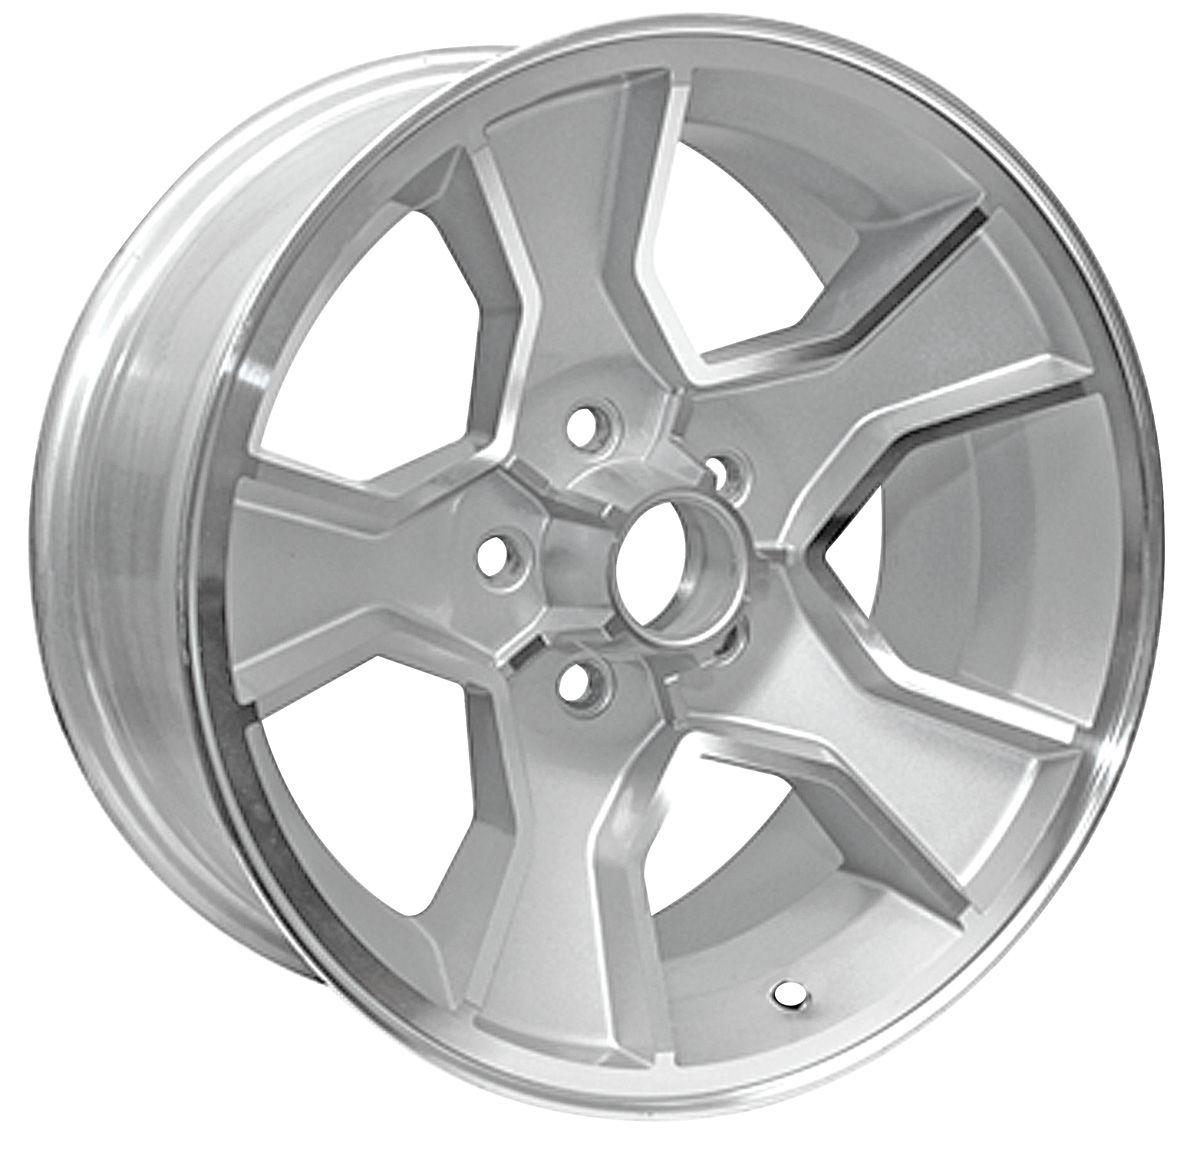 "1986-88 Wheel, N90 (Monte Carlo) Silver, 17"" X 8"" (B.S. 4"